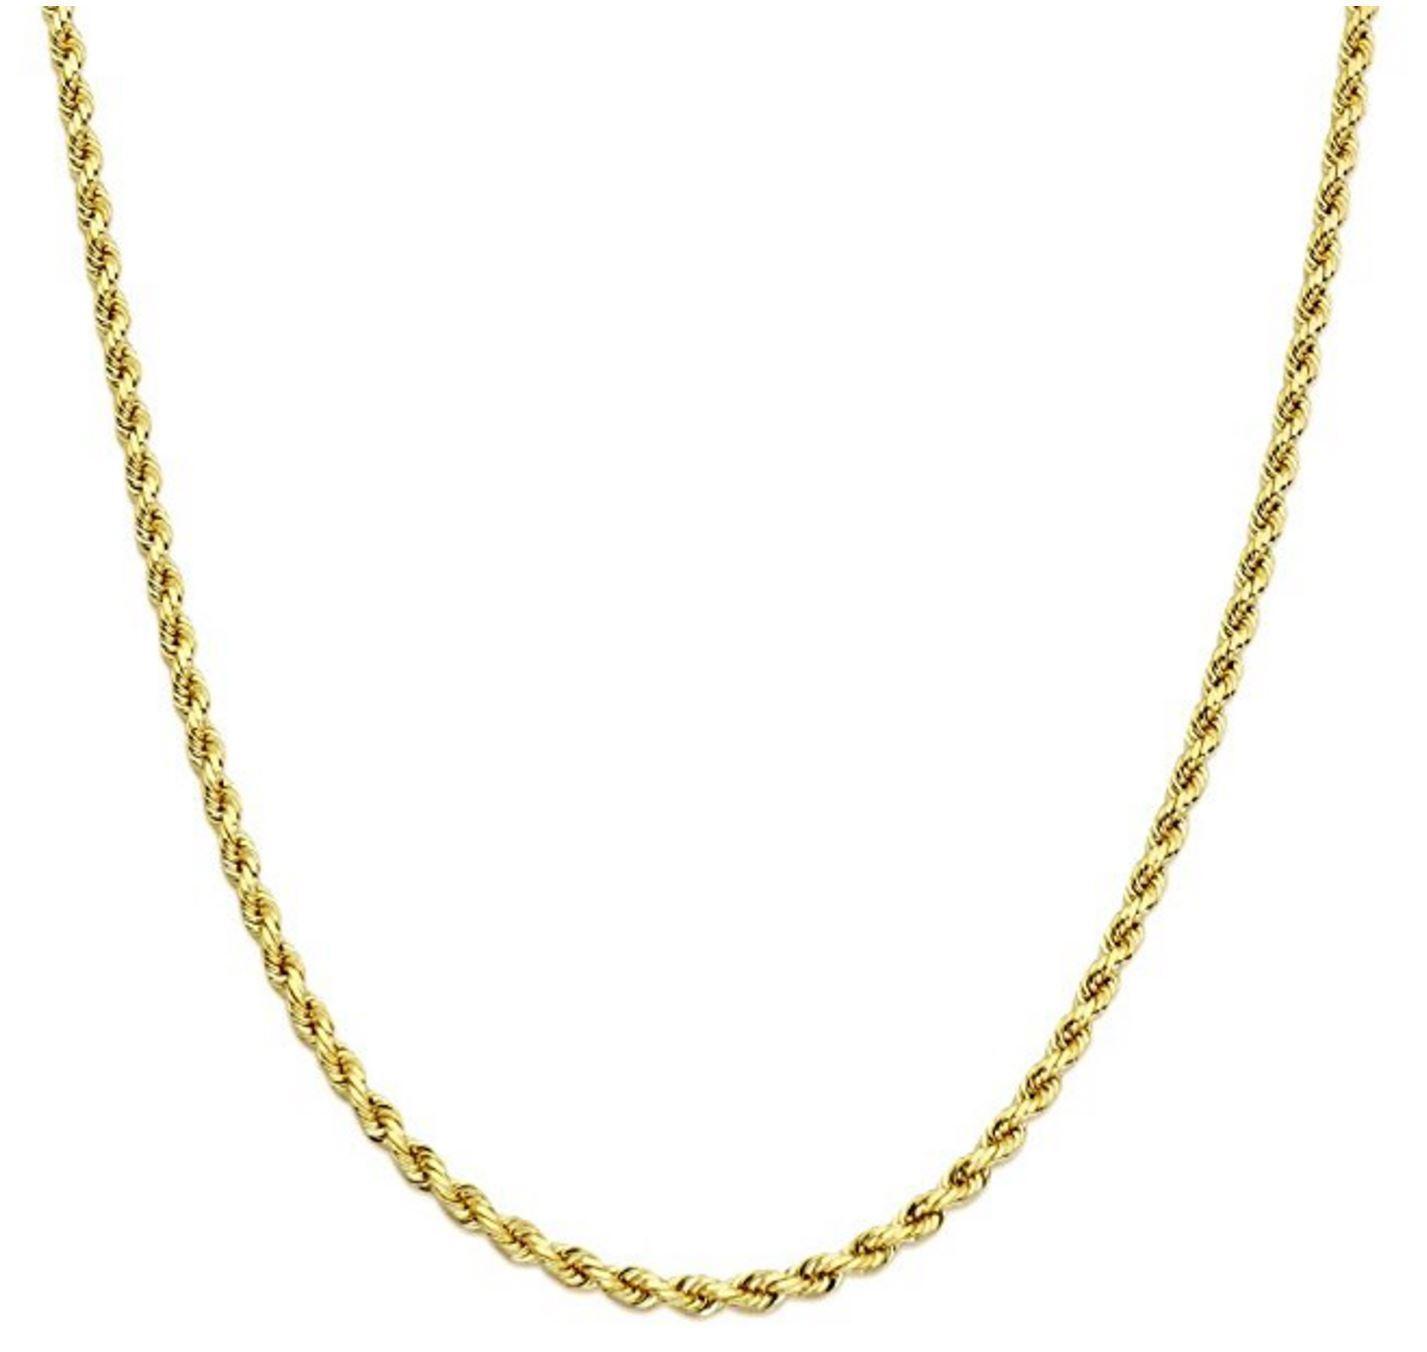 10K Yellow Gold 1.8mm – 8mm Men's Women's Hollow Diamond Cut Rope Chain Necklace Fine Jewelry